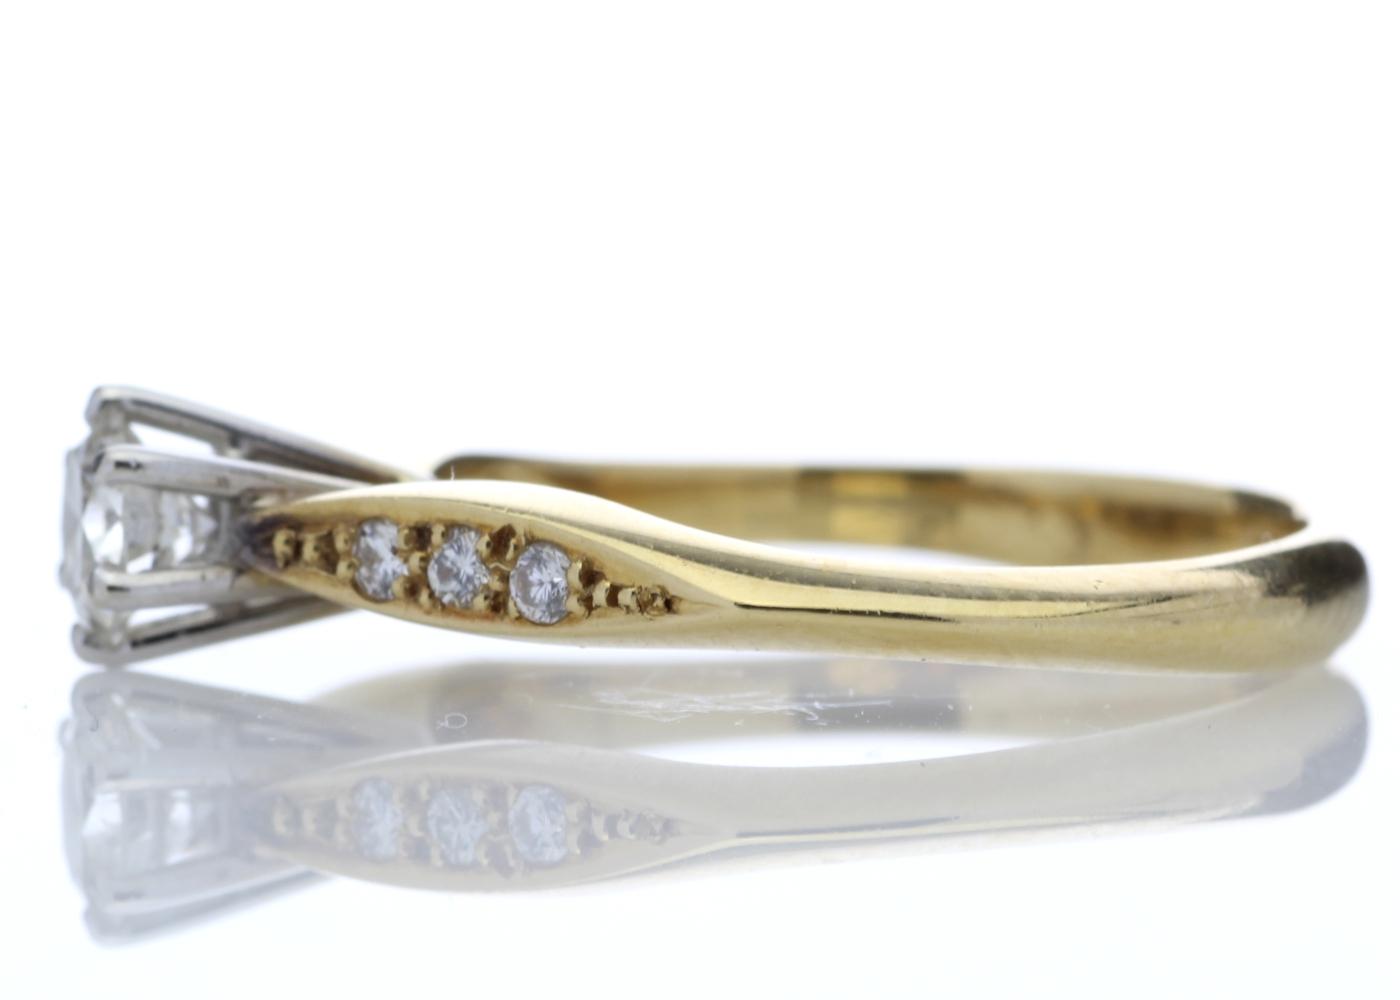 18ct Stone Set Shoulders Diamond Ring 0.42 Carats - Image 3 of 4